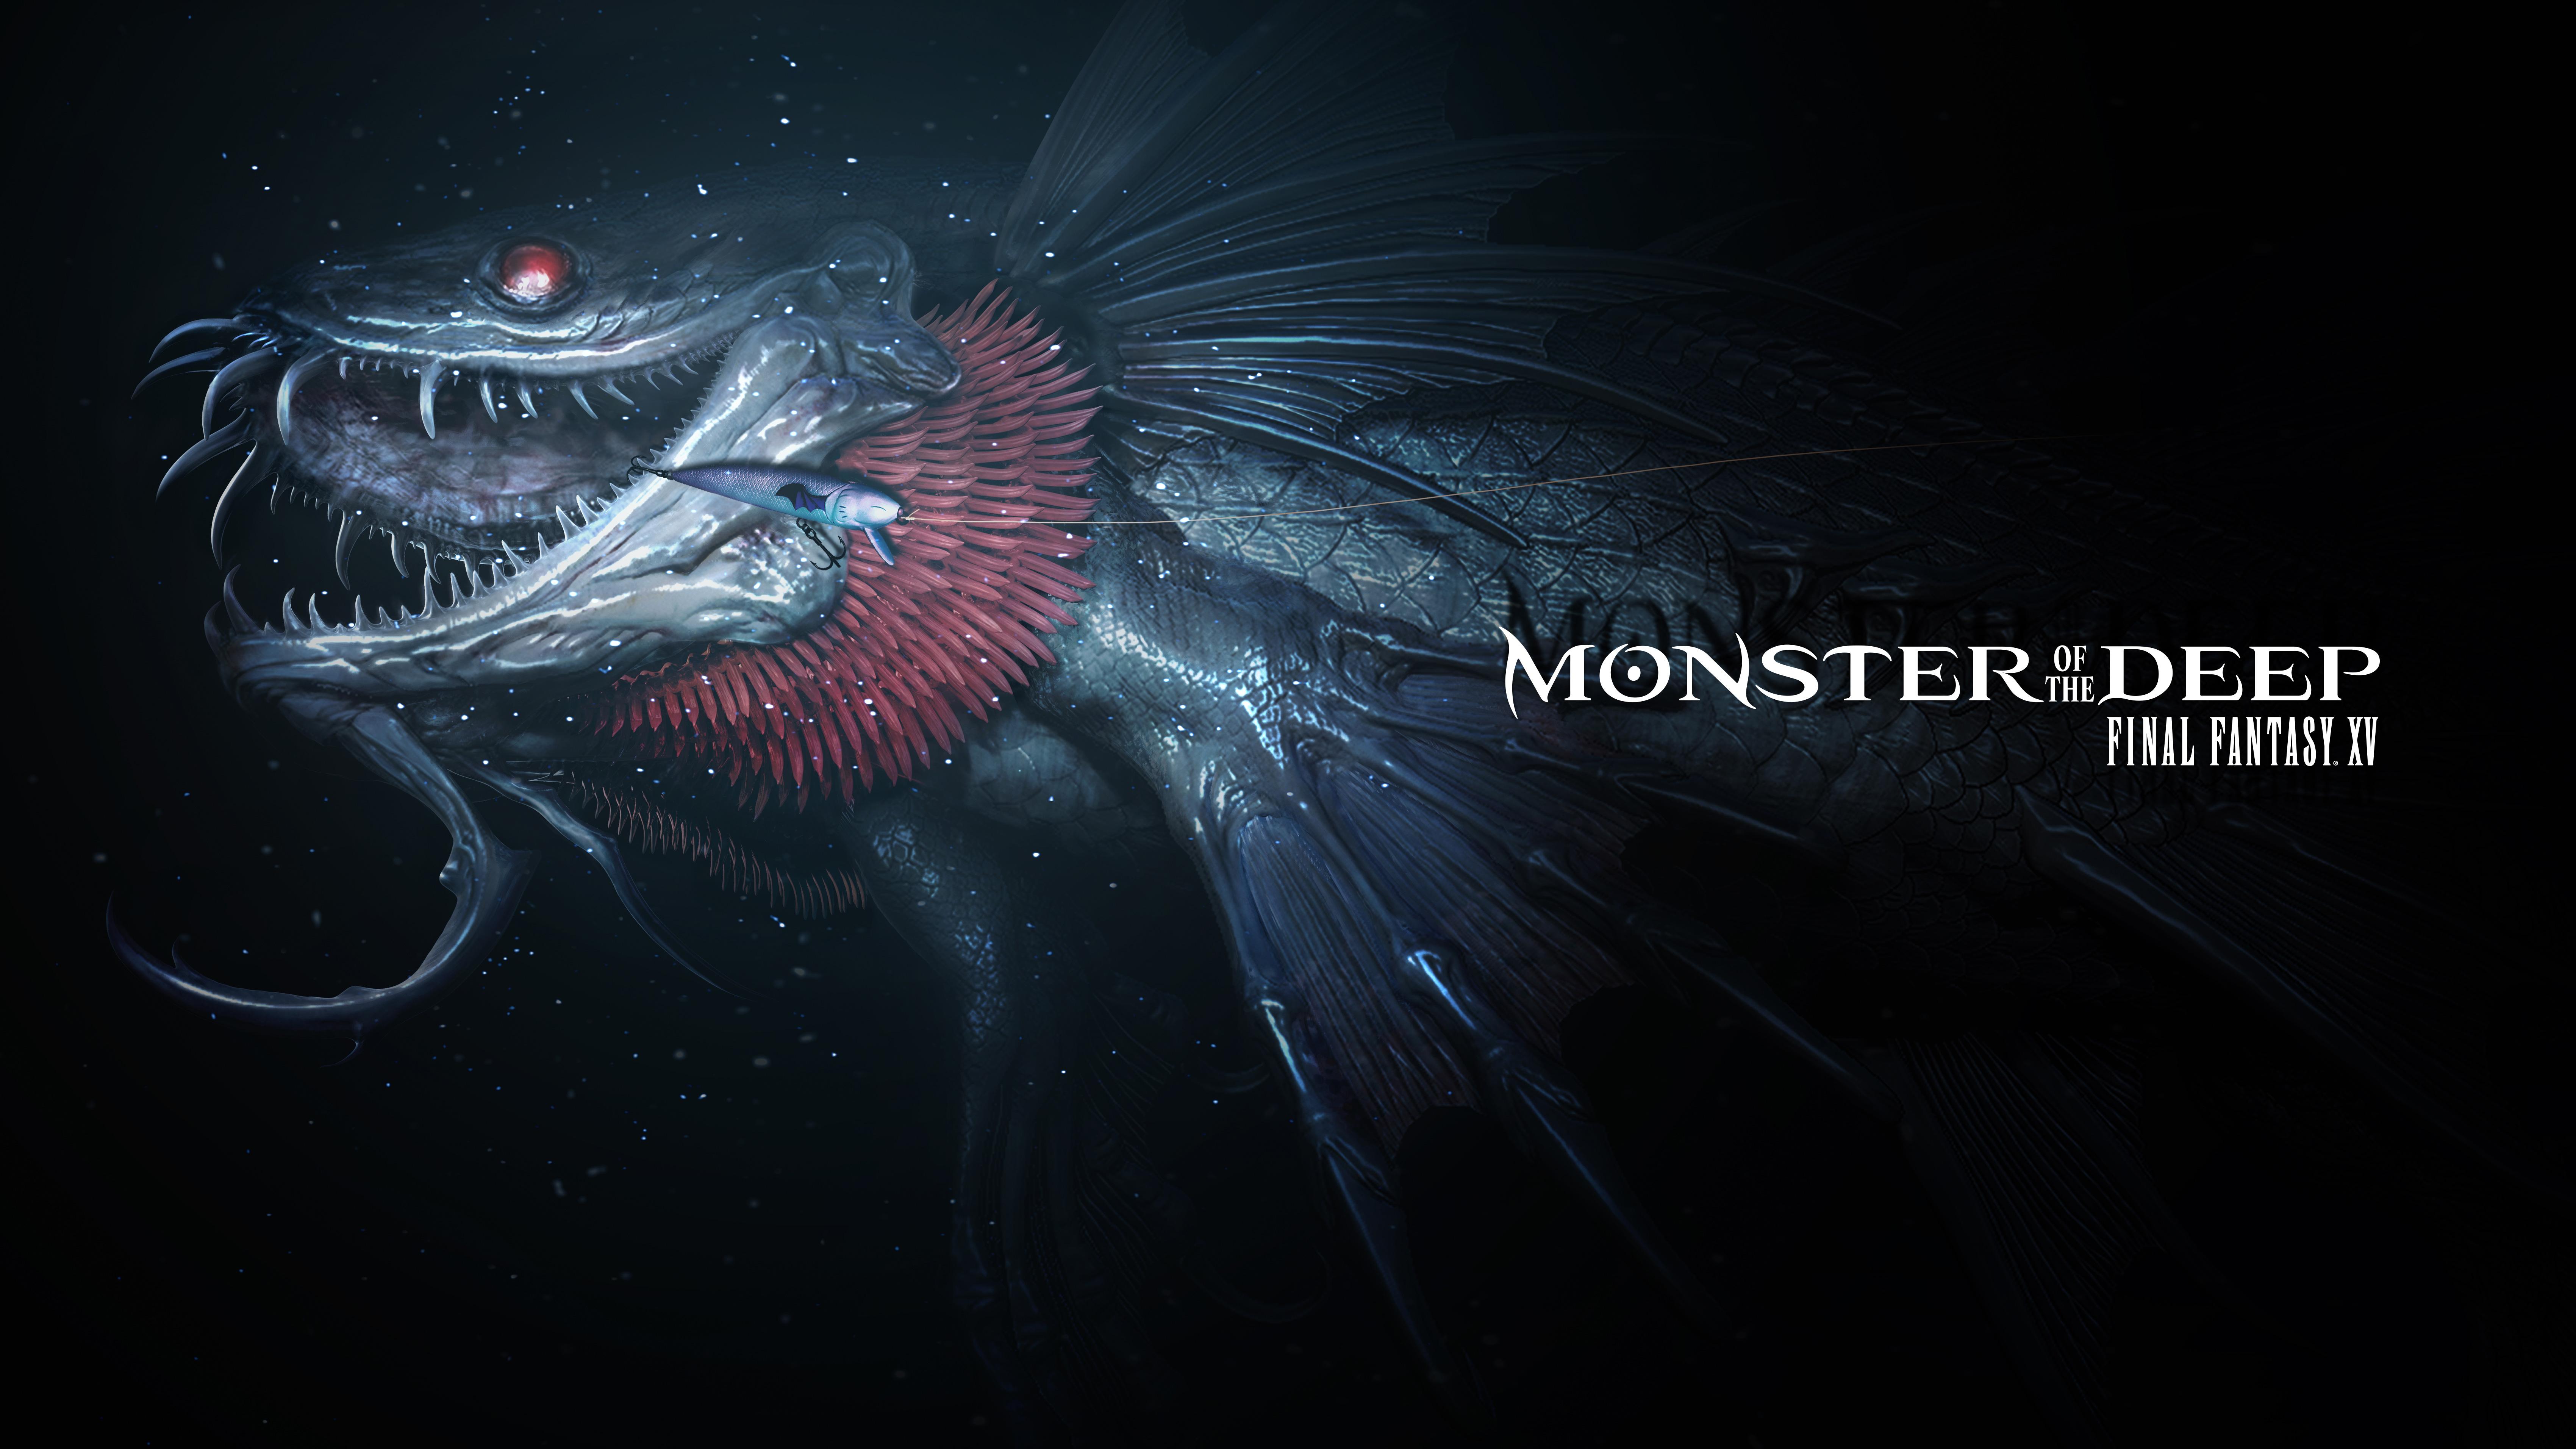 2560x1080 Luna Final Fantasy Xv 4k 2560x1080 Resolution Hd: Monster Of The Deep Final Fantasy XV E3 2017 Artwork, HD